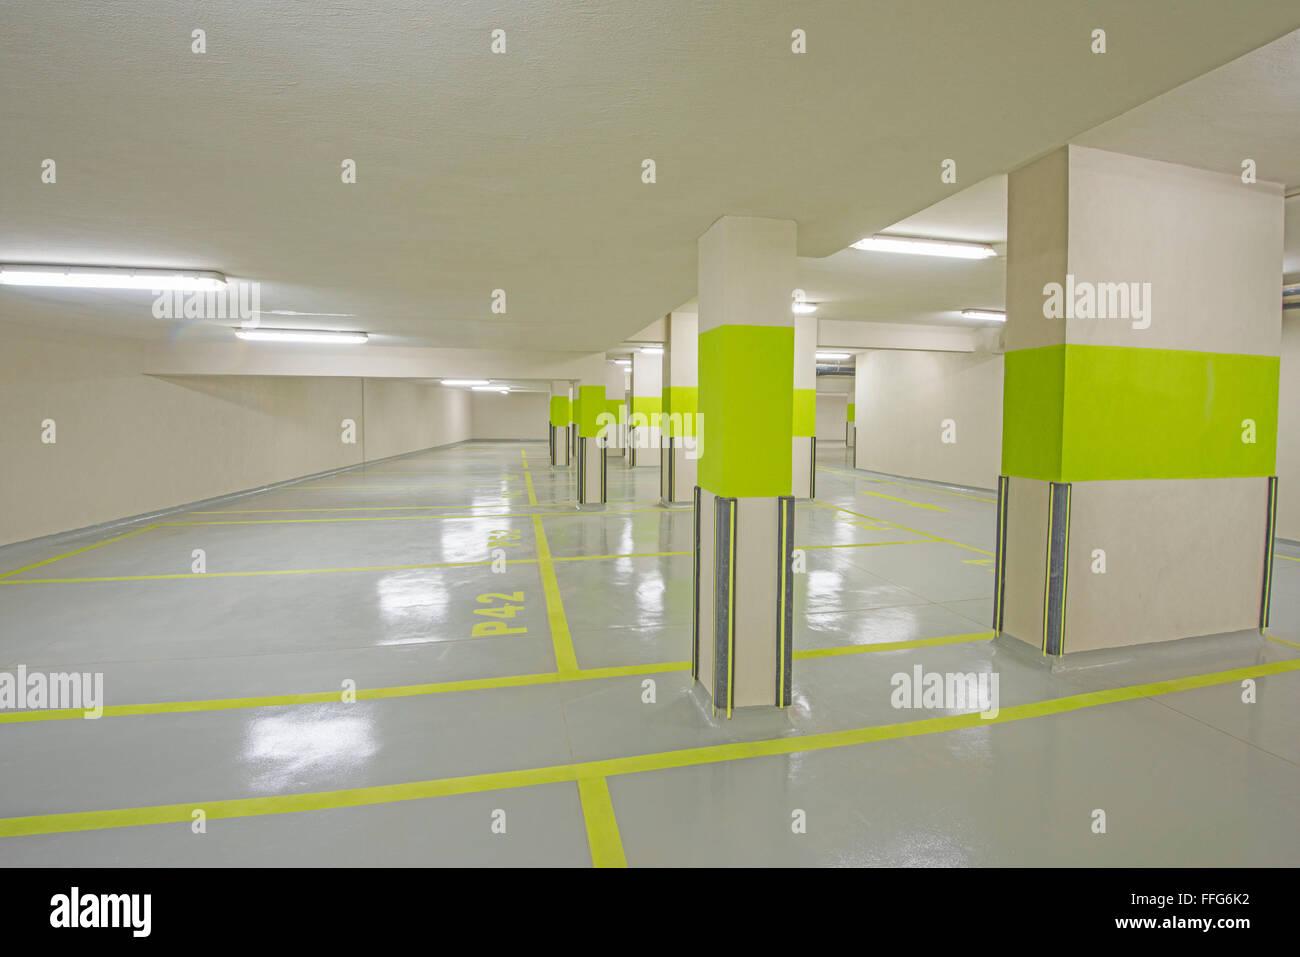 Design of basement car parking - Interior Of A New Modern Underground Car Park Beneath An Apartment Building With Columns Stock